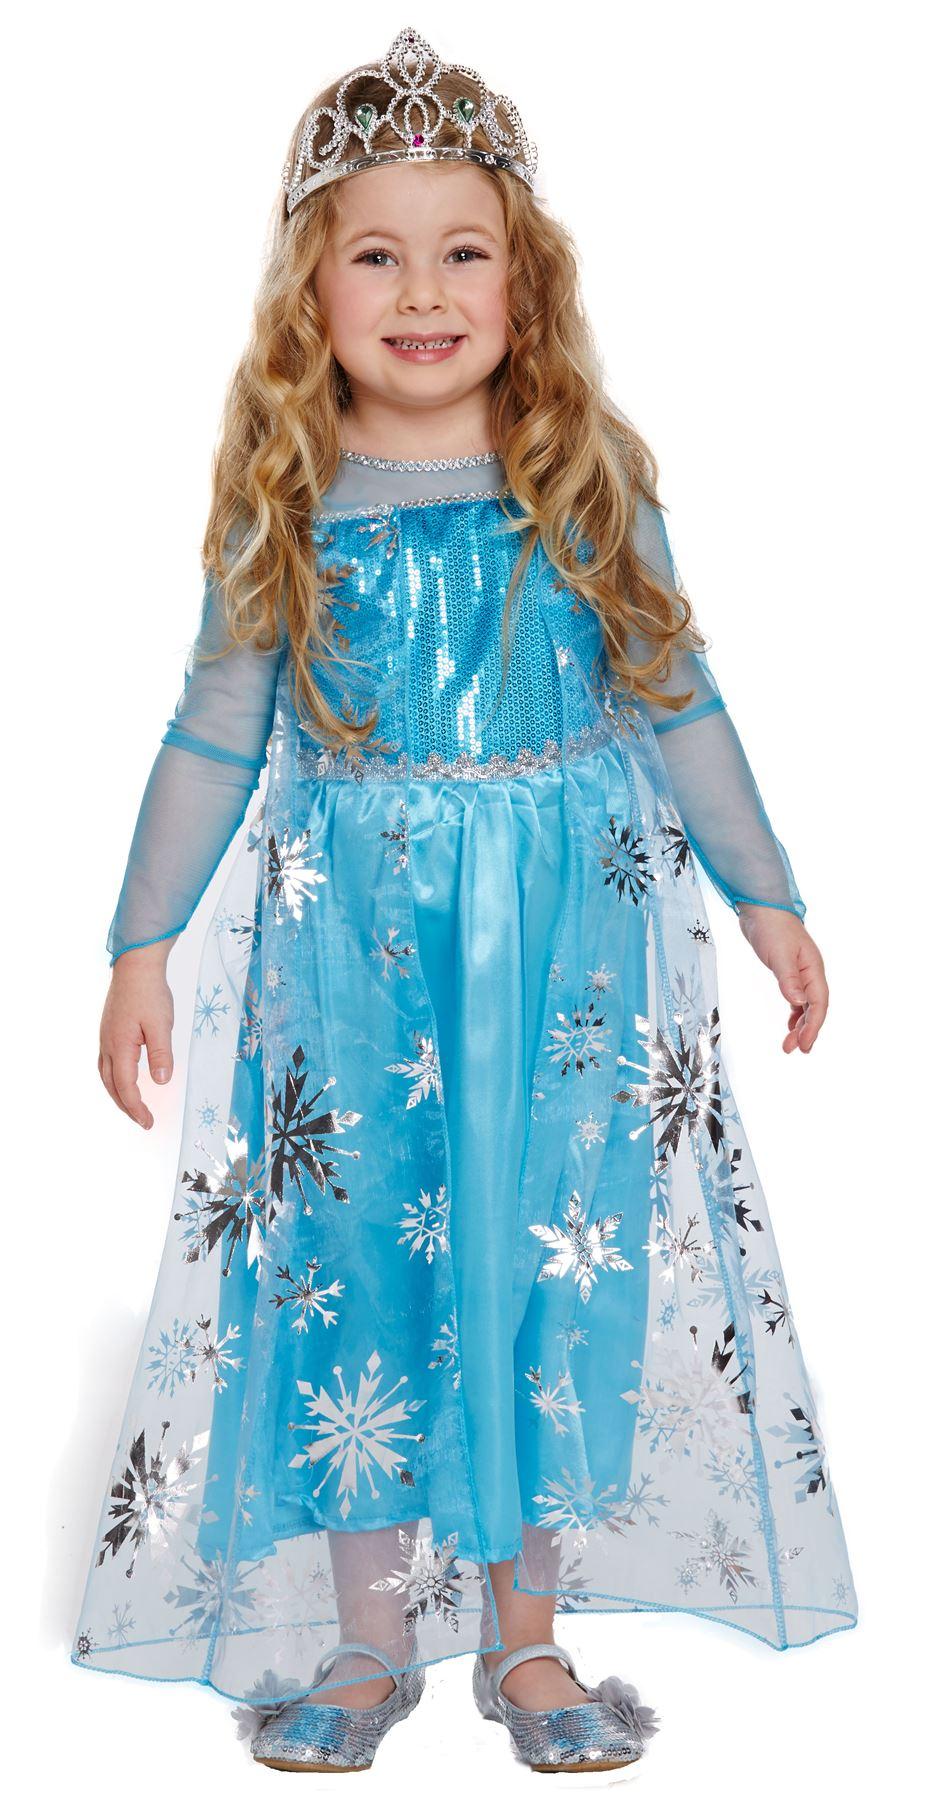 Childrens Frozen Ice Snow Queen Girls Fancy Dress Costume 3yrs ...